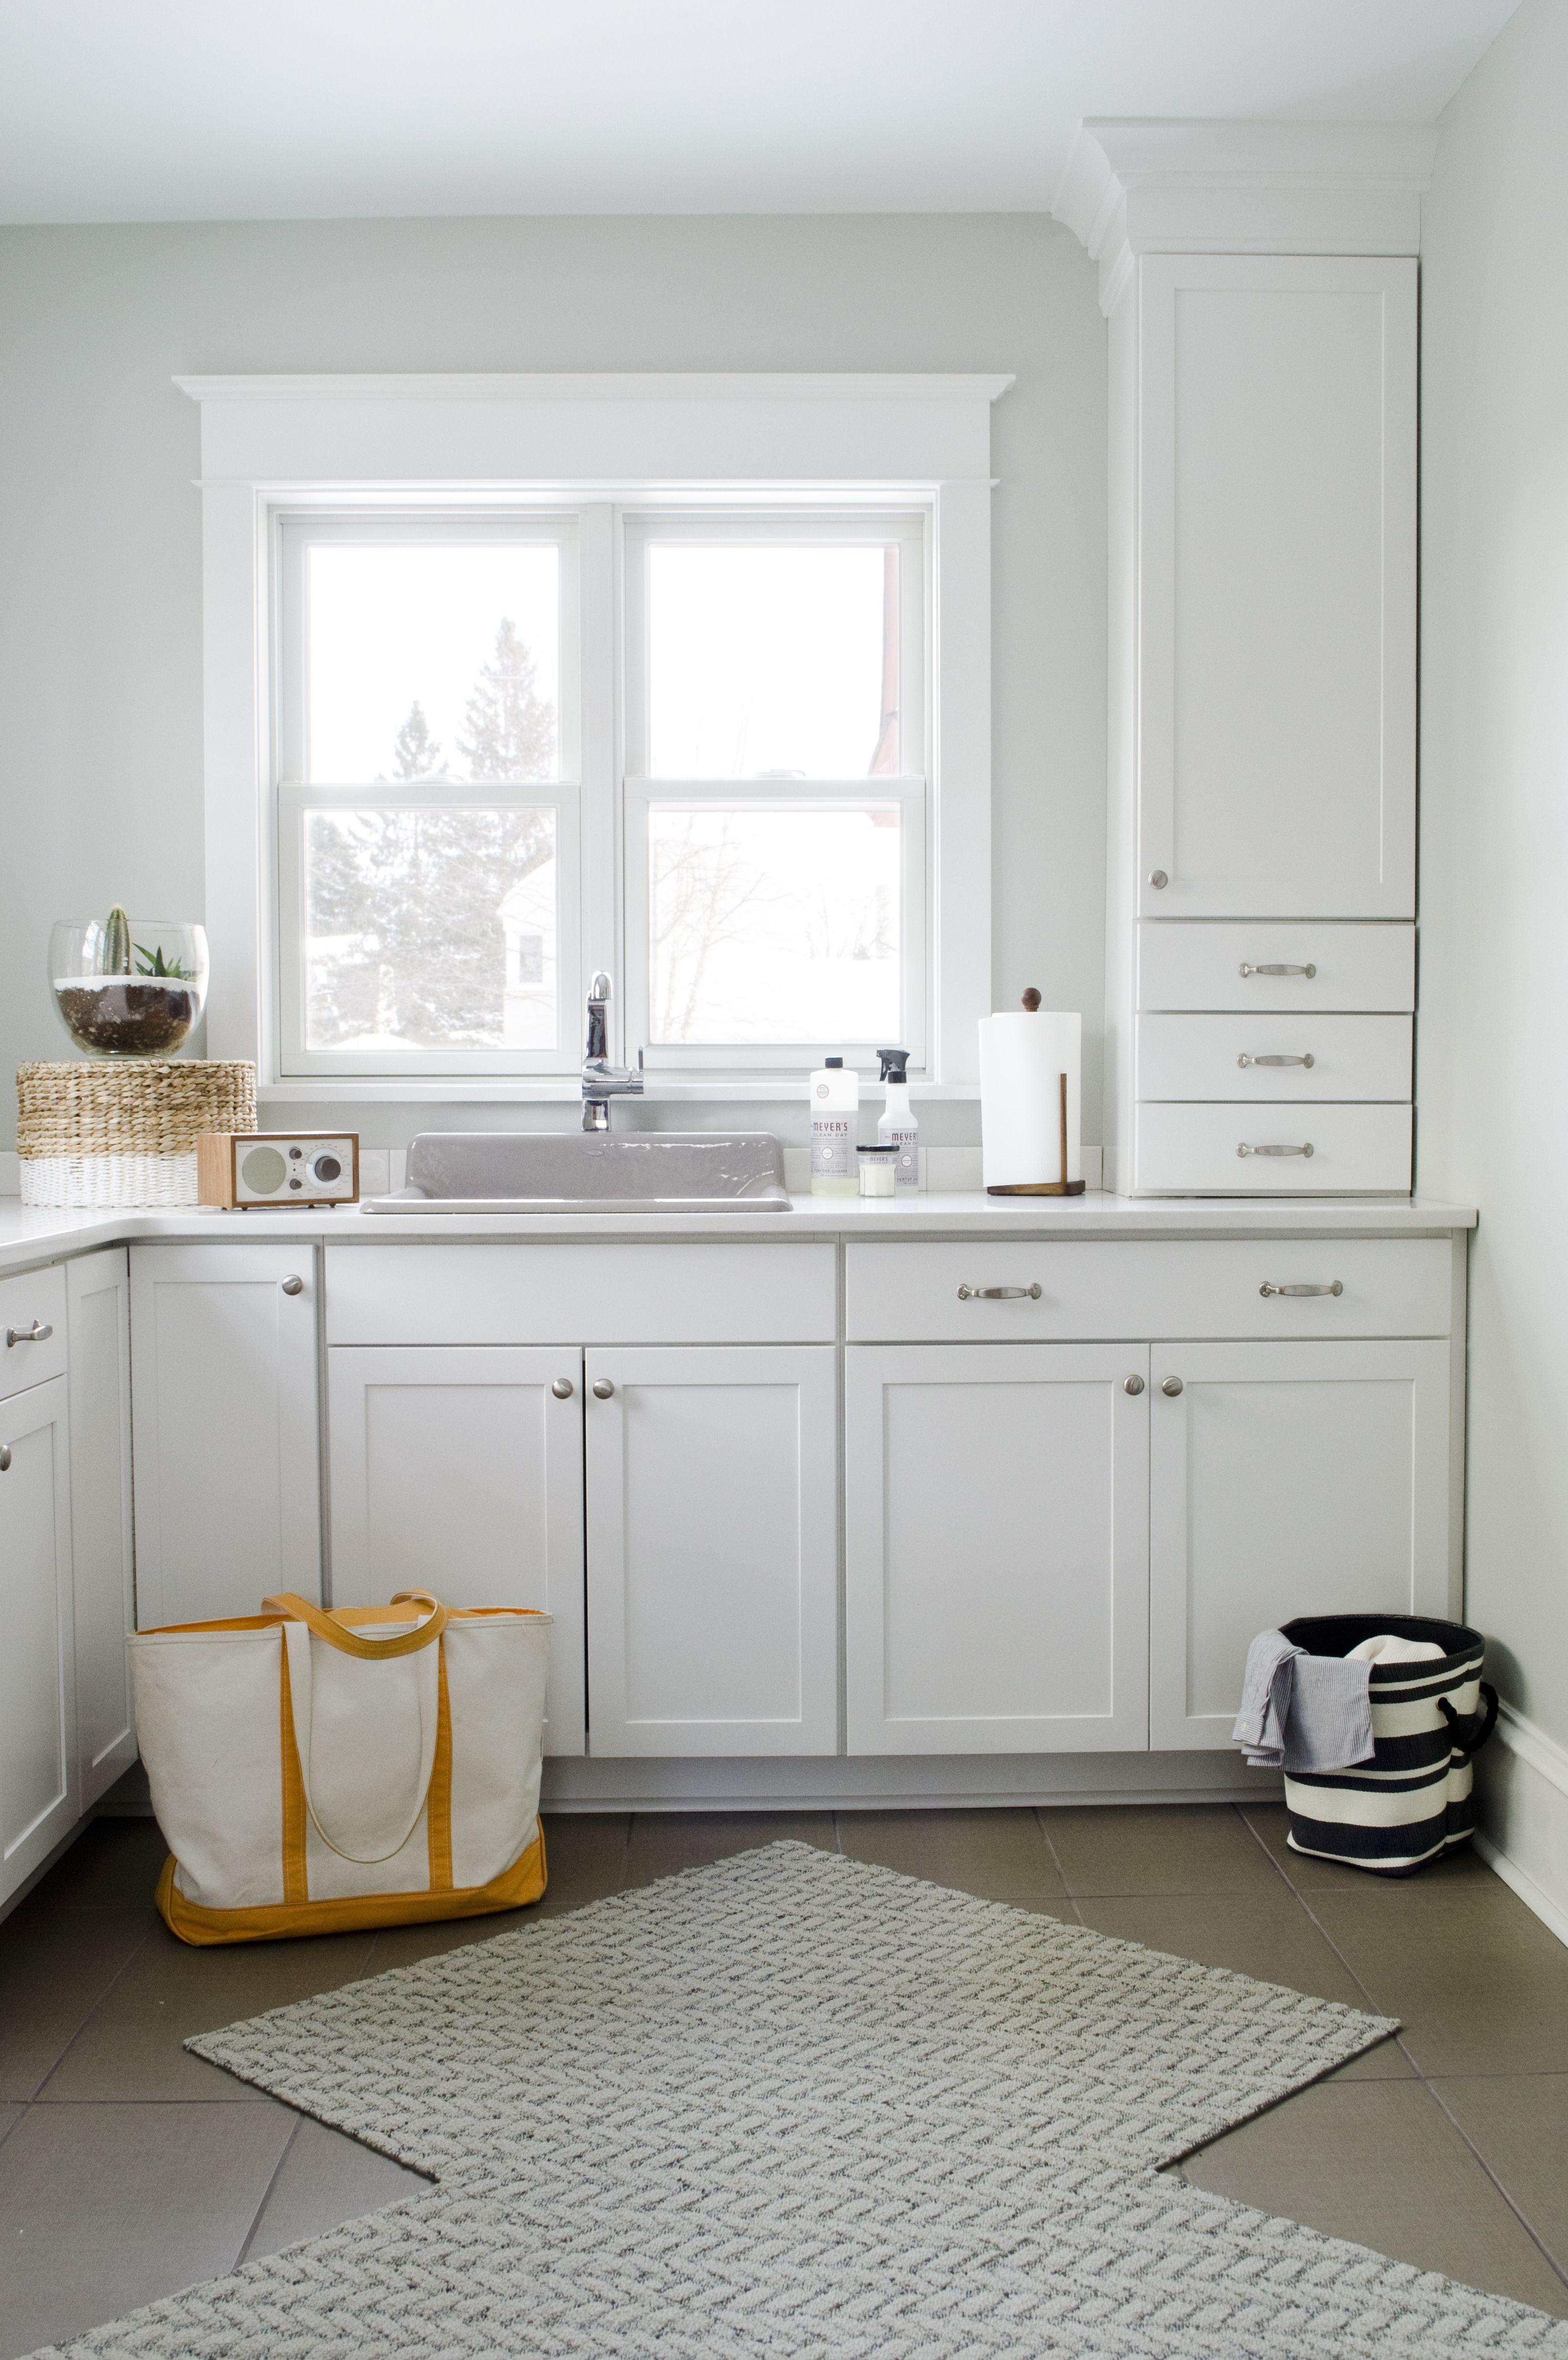 Aristokraft Winstead door style in white provides a